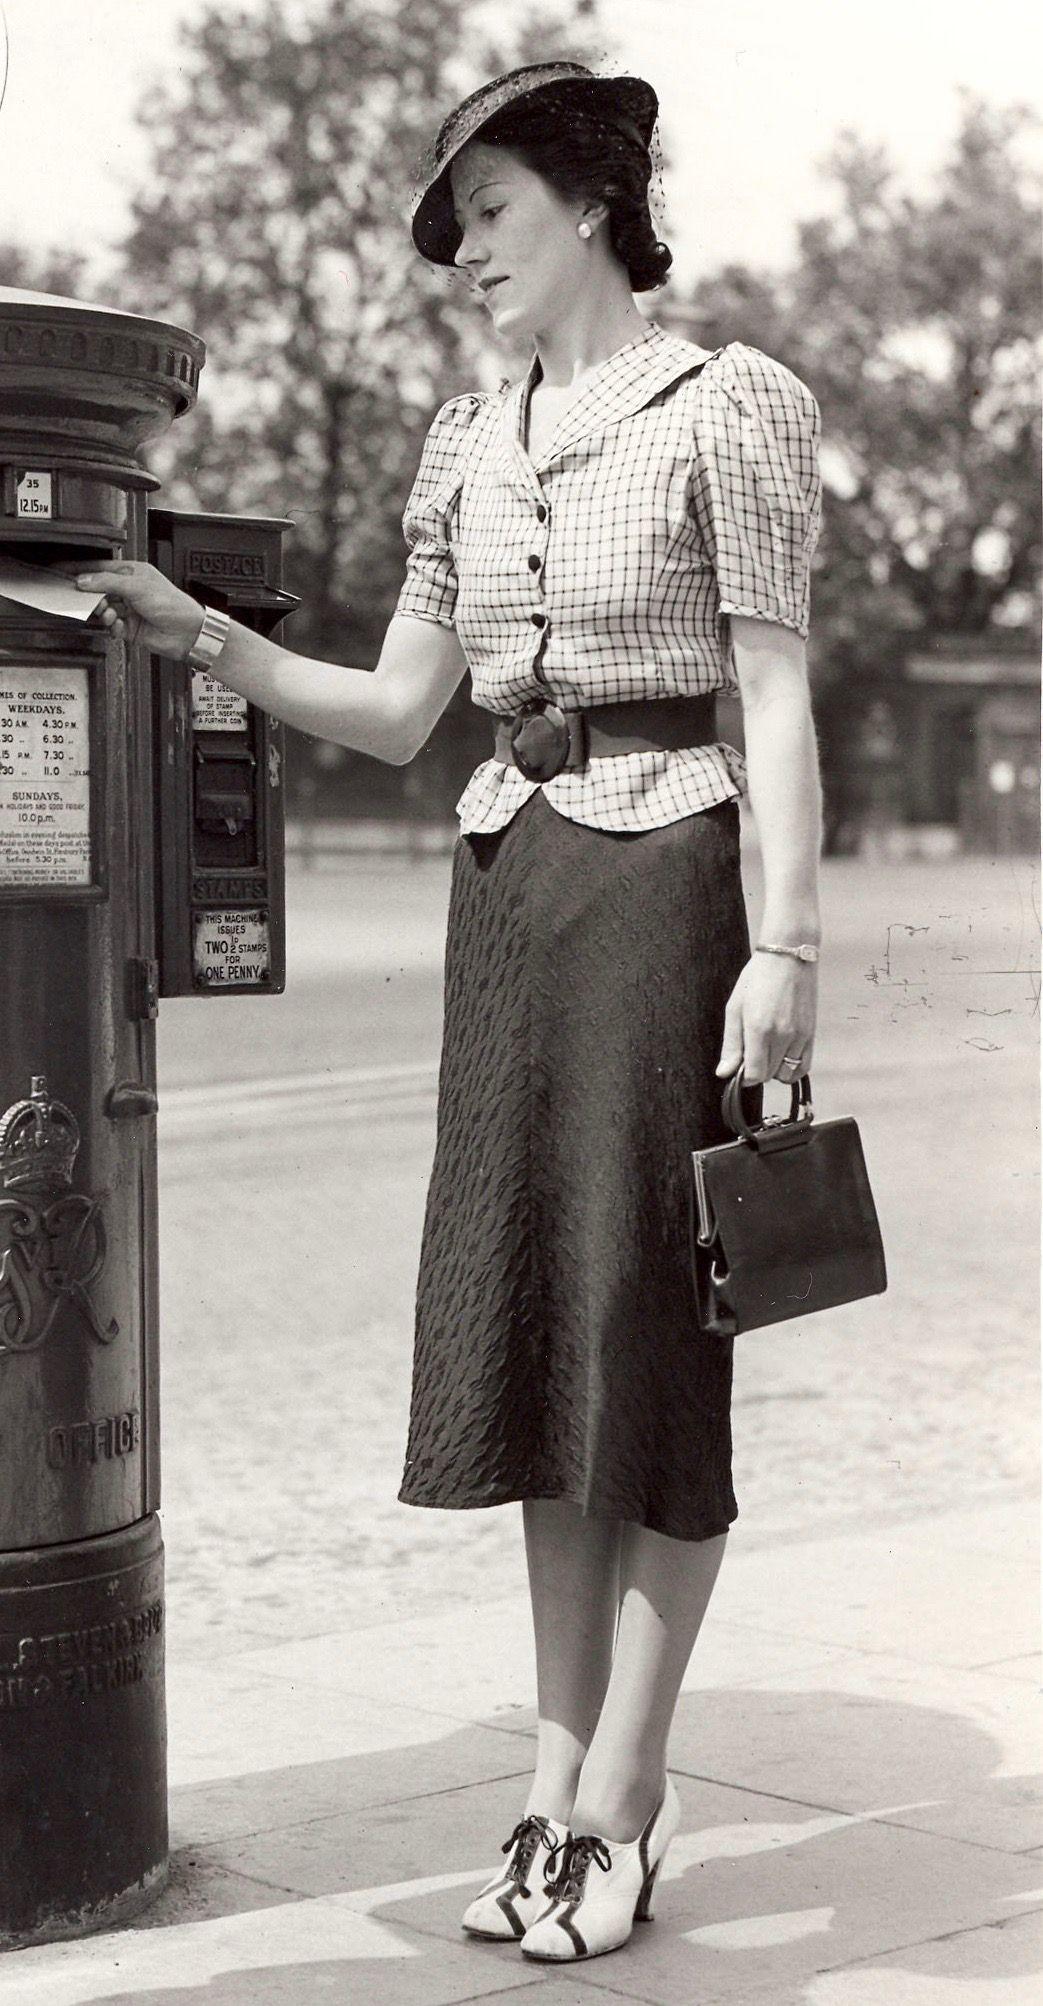 Mode 30 Noire Mode Jupes Vintage Année Robe Tailleur Crayon 1930s gqEdawa